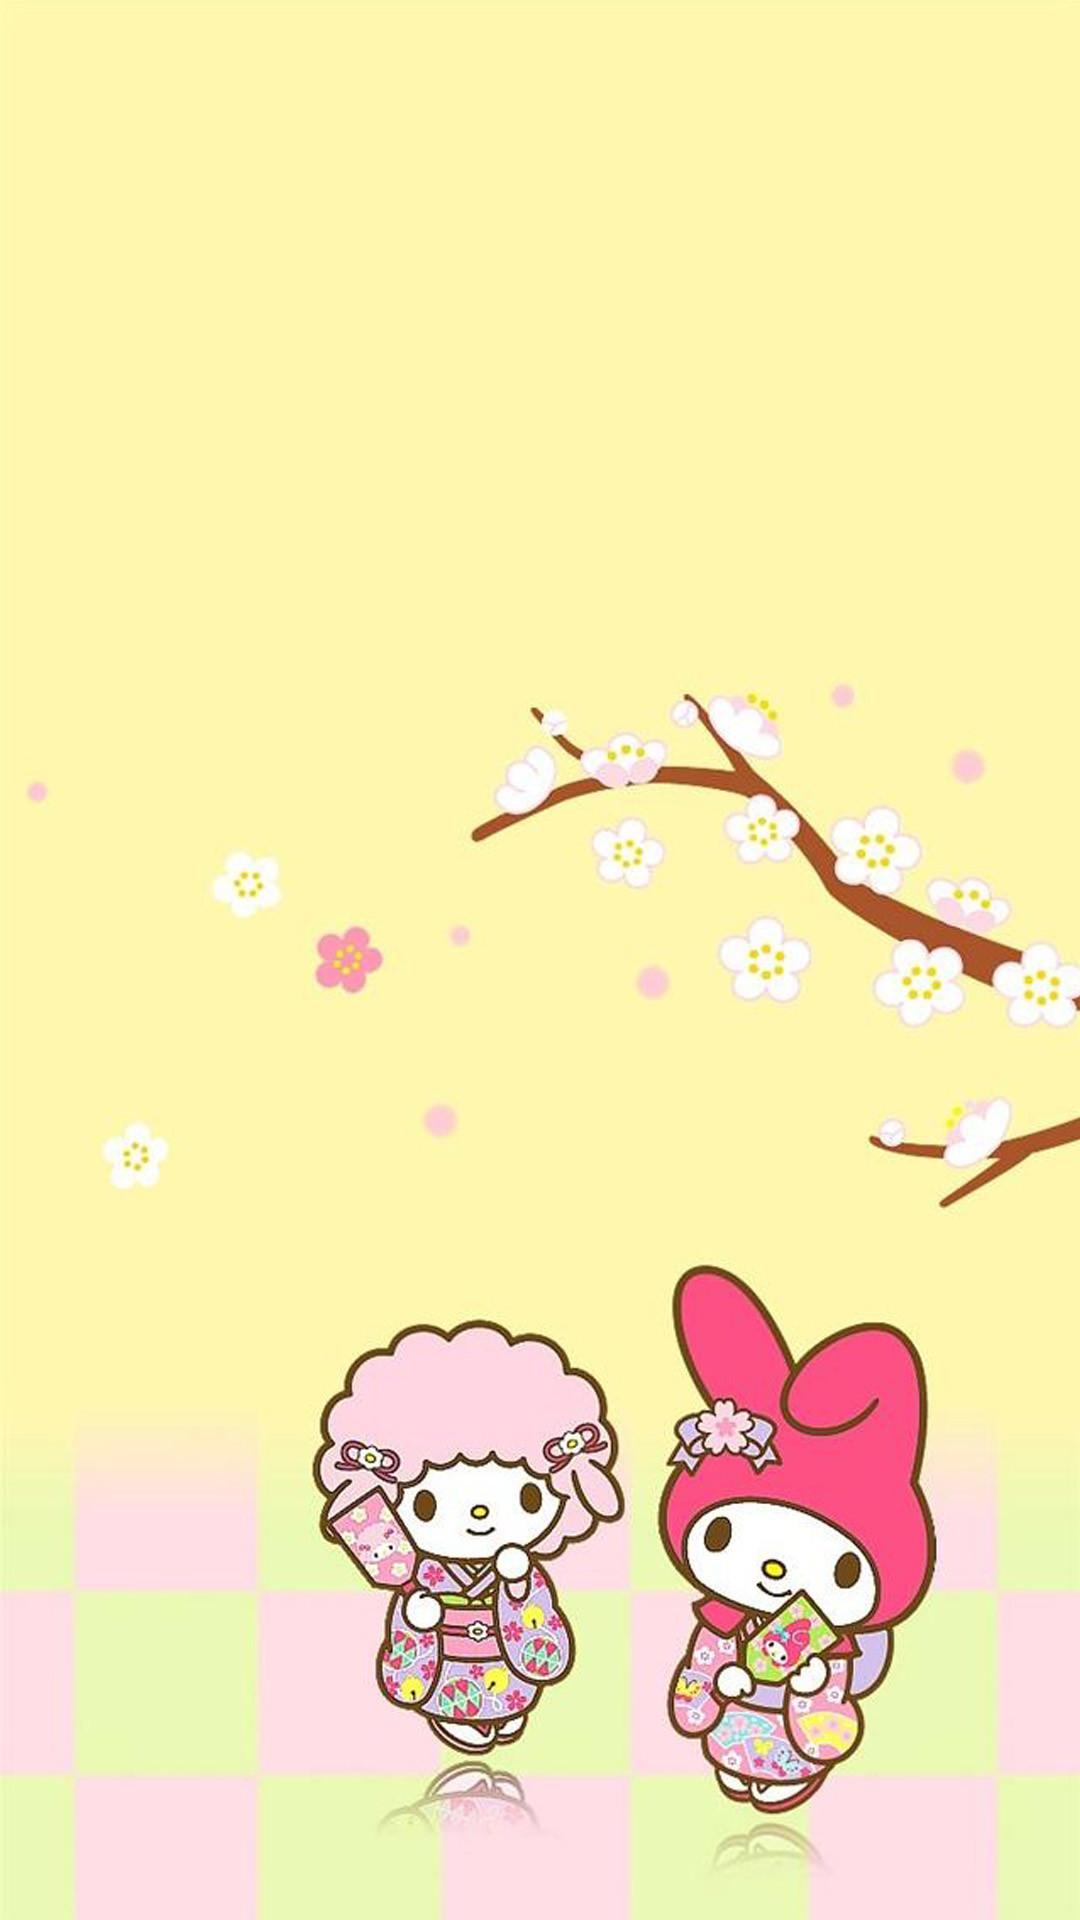 1280x1920 Sushi Kawaii Girly Pink Light Switch Plate Bedroom Wall Art Cute Home Decor WallpaperWallpaper For IphoneKawaii